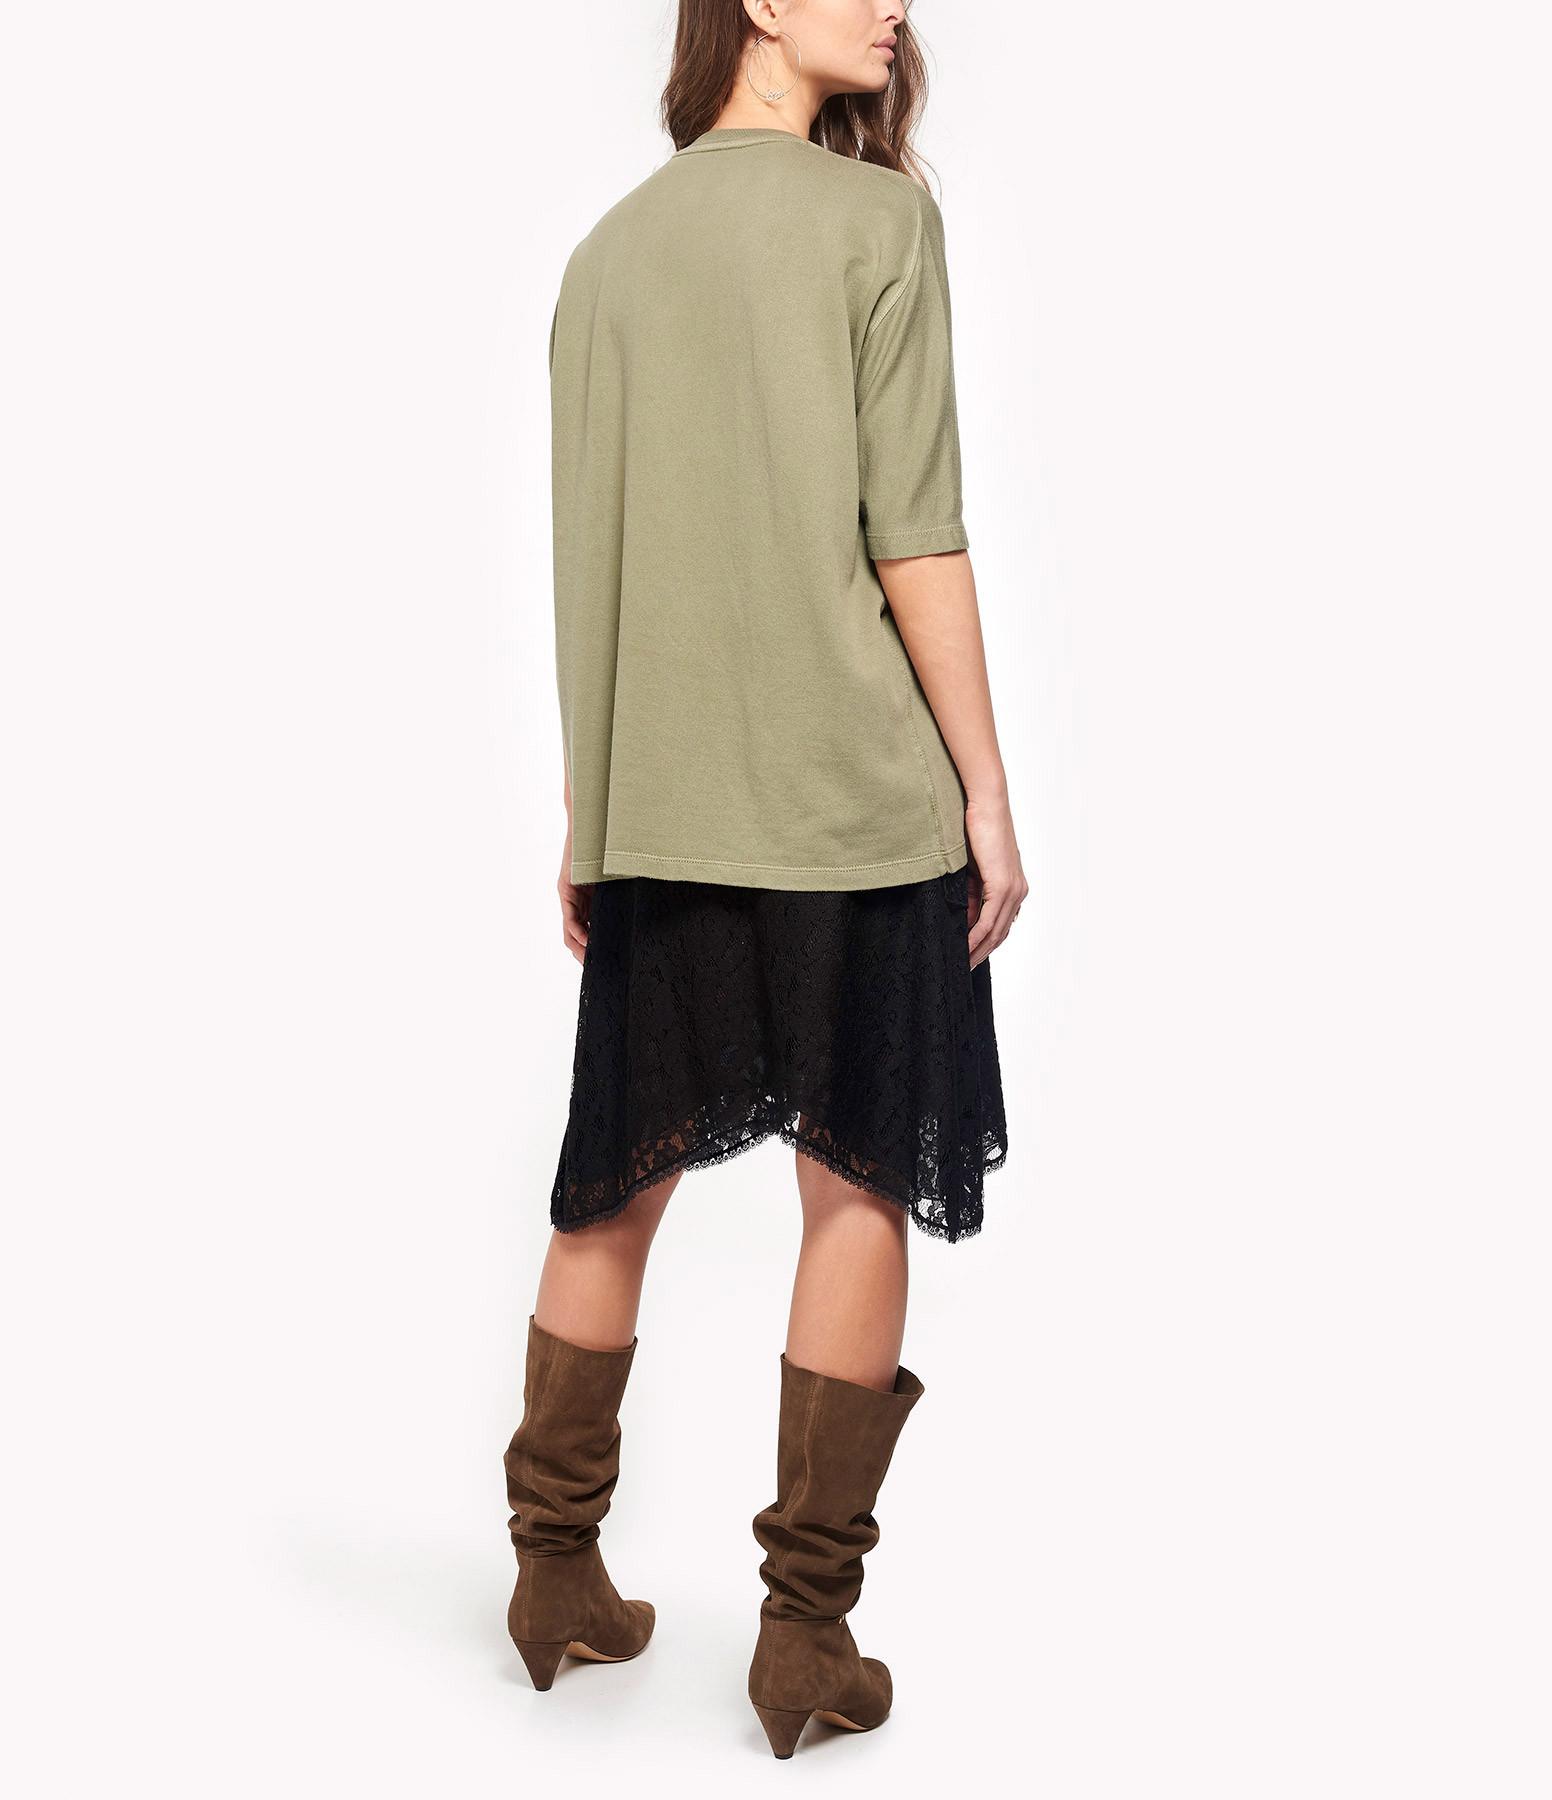 ZADIG & VOLTAIRE - Sweatshirt Portland Amour Coton Kaki